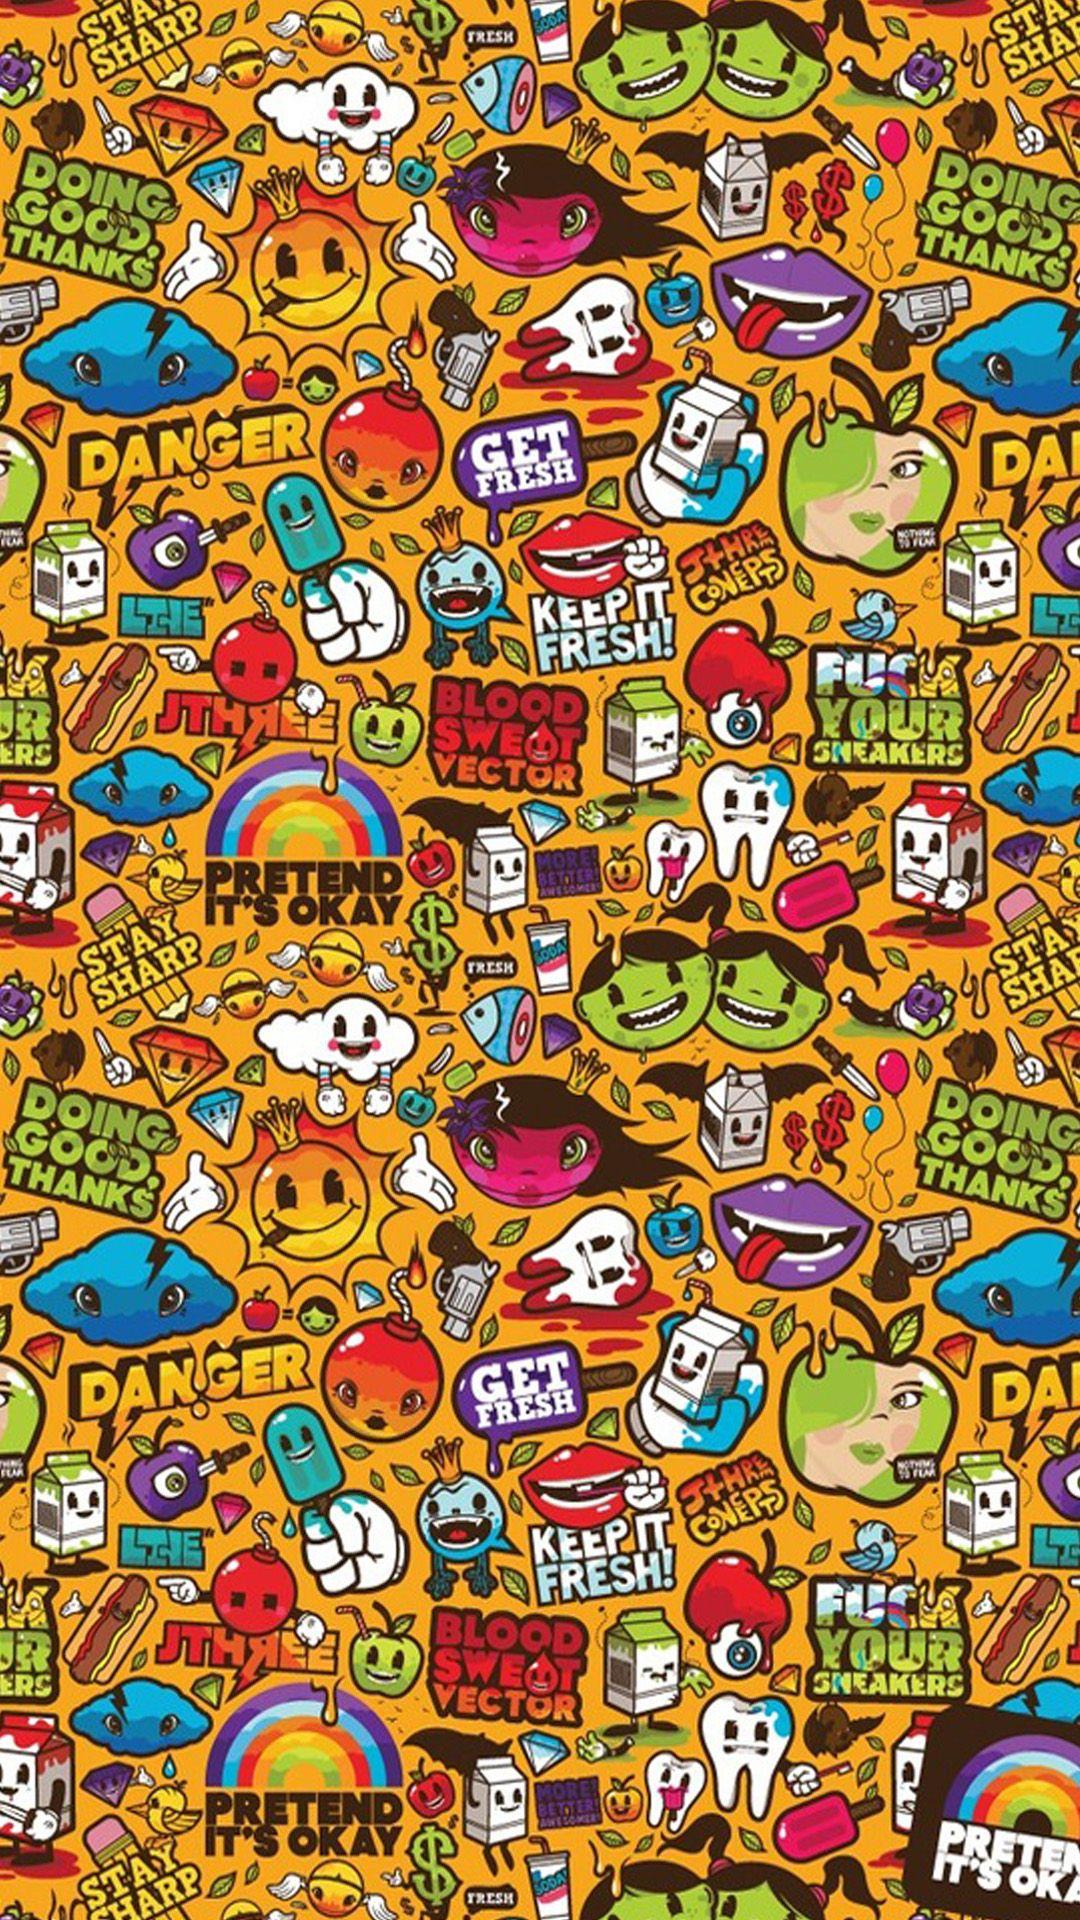 Glitter Rainbow Iphone Wallpaper ipcwallpapers in 2020